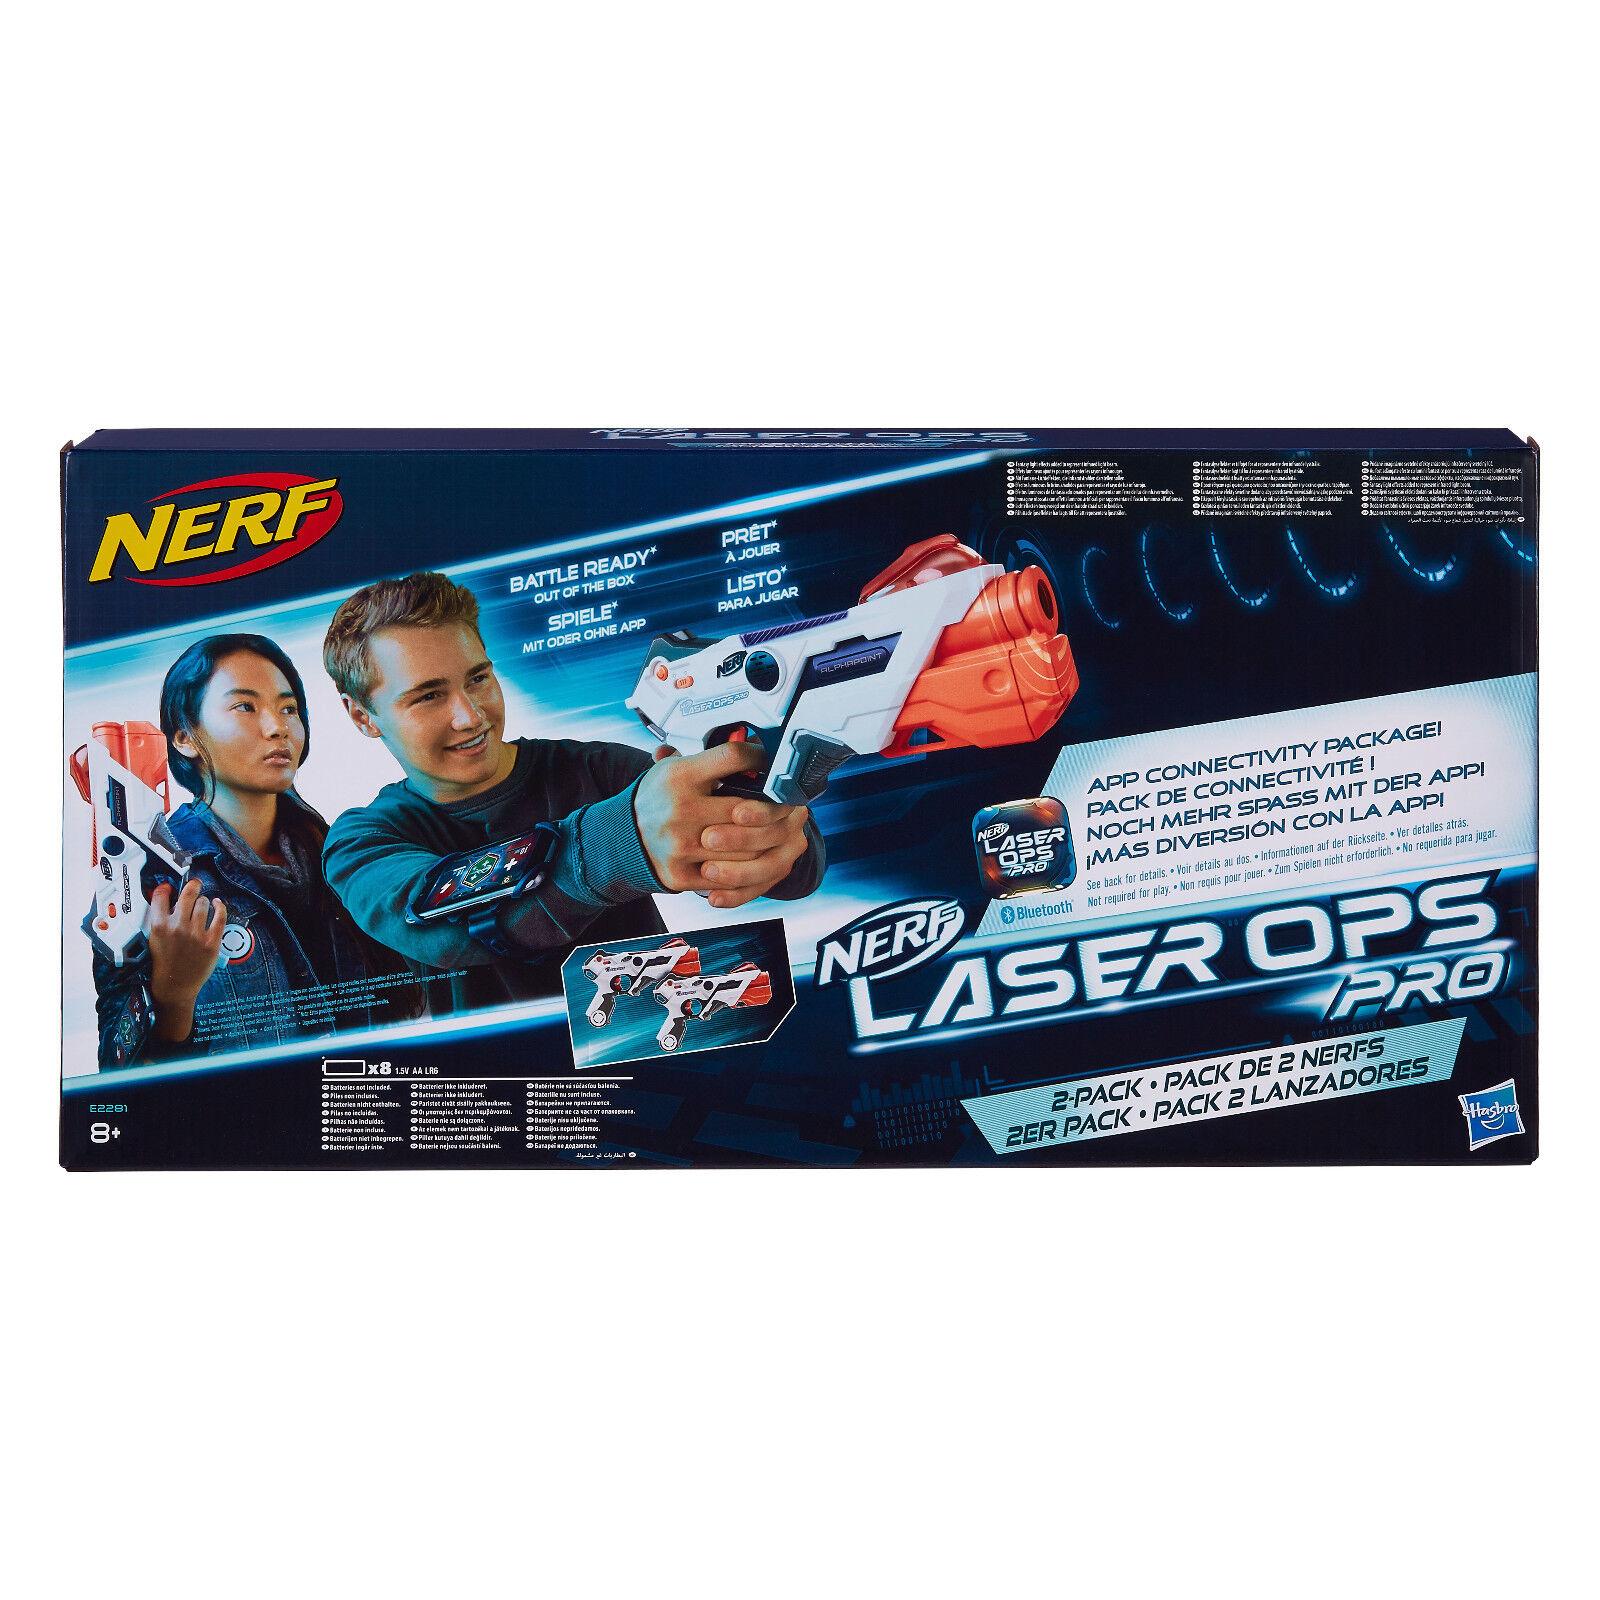 Nerf E2281 - Láser Ops pro Alphapoint, 2er-PACK, Nuevo   Embalaje Original